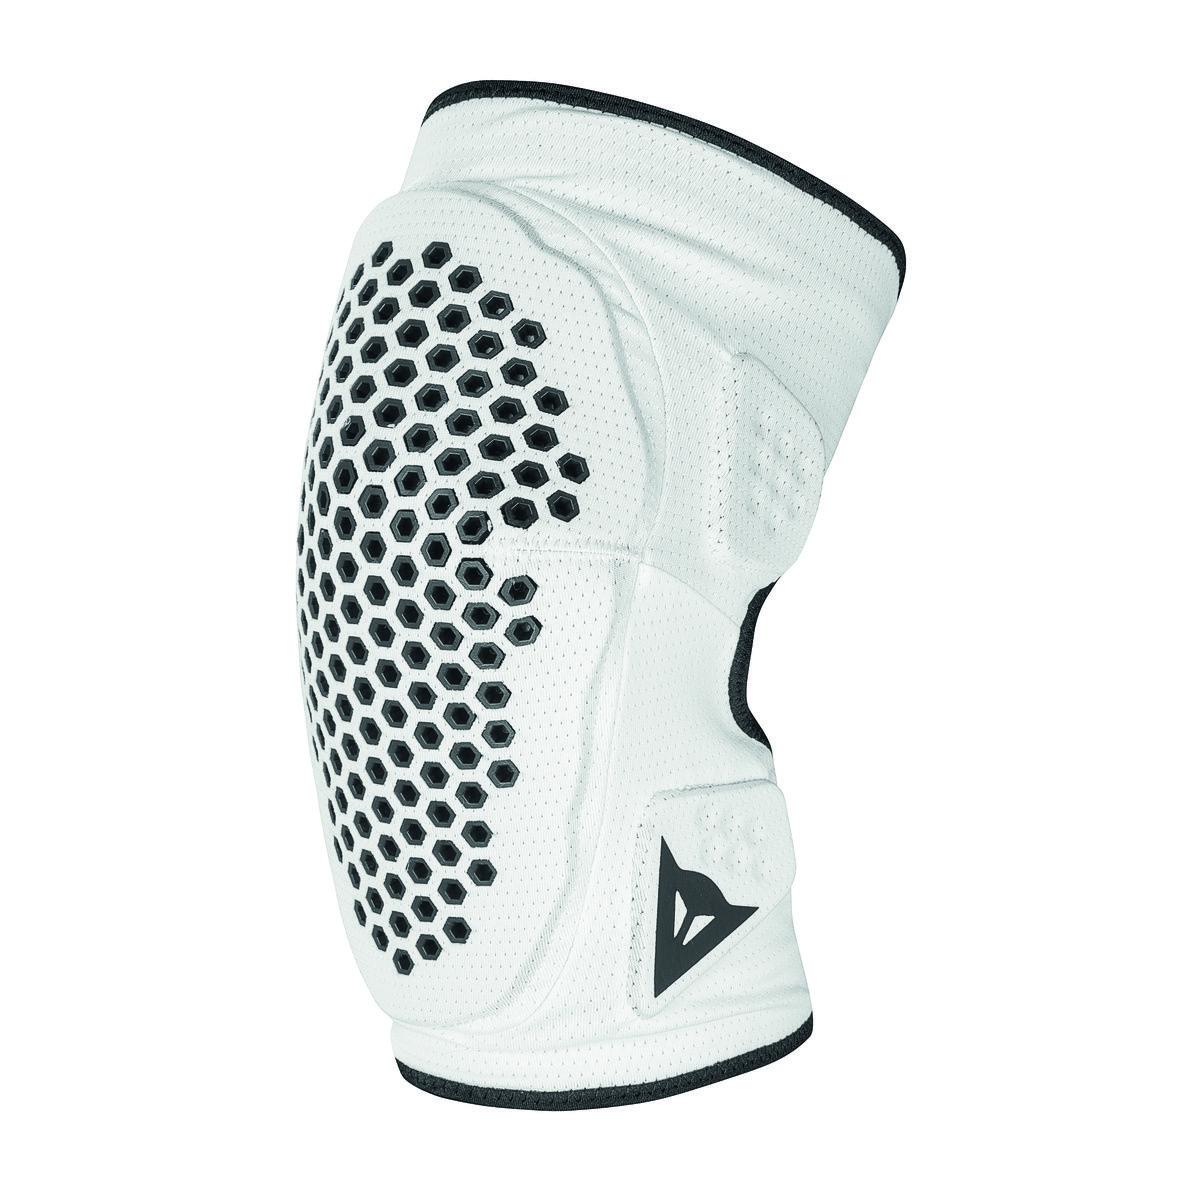 Soft Skins Knee Guard Skin So Soft Winter Gear Sneakers Nike